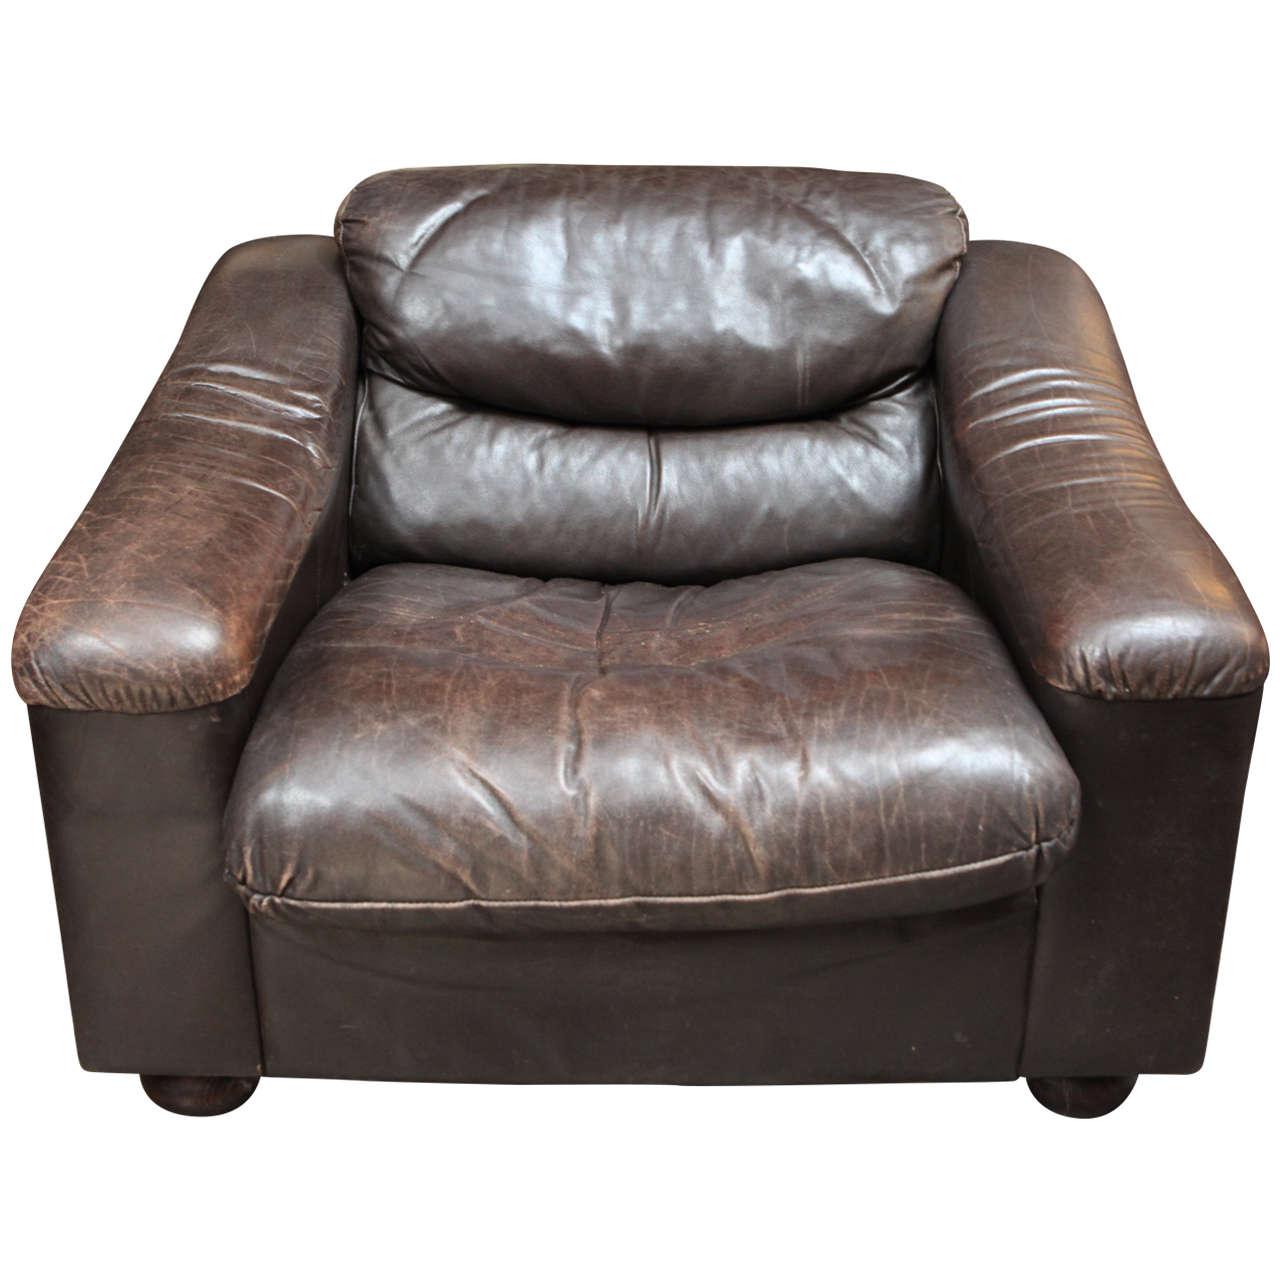 Wonderful Plush Low Leather Armchair, Circa 1900 For Sale